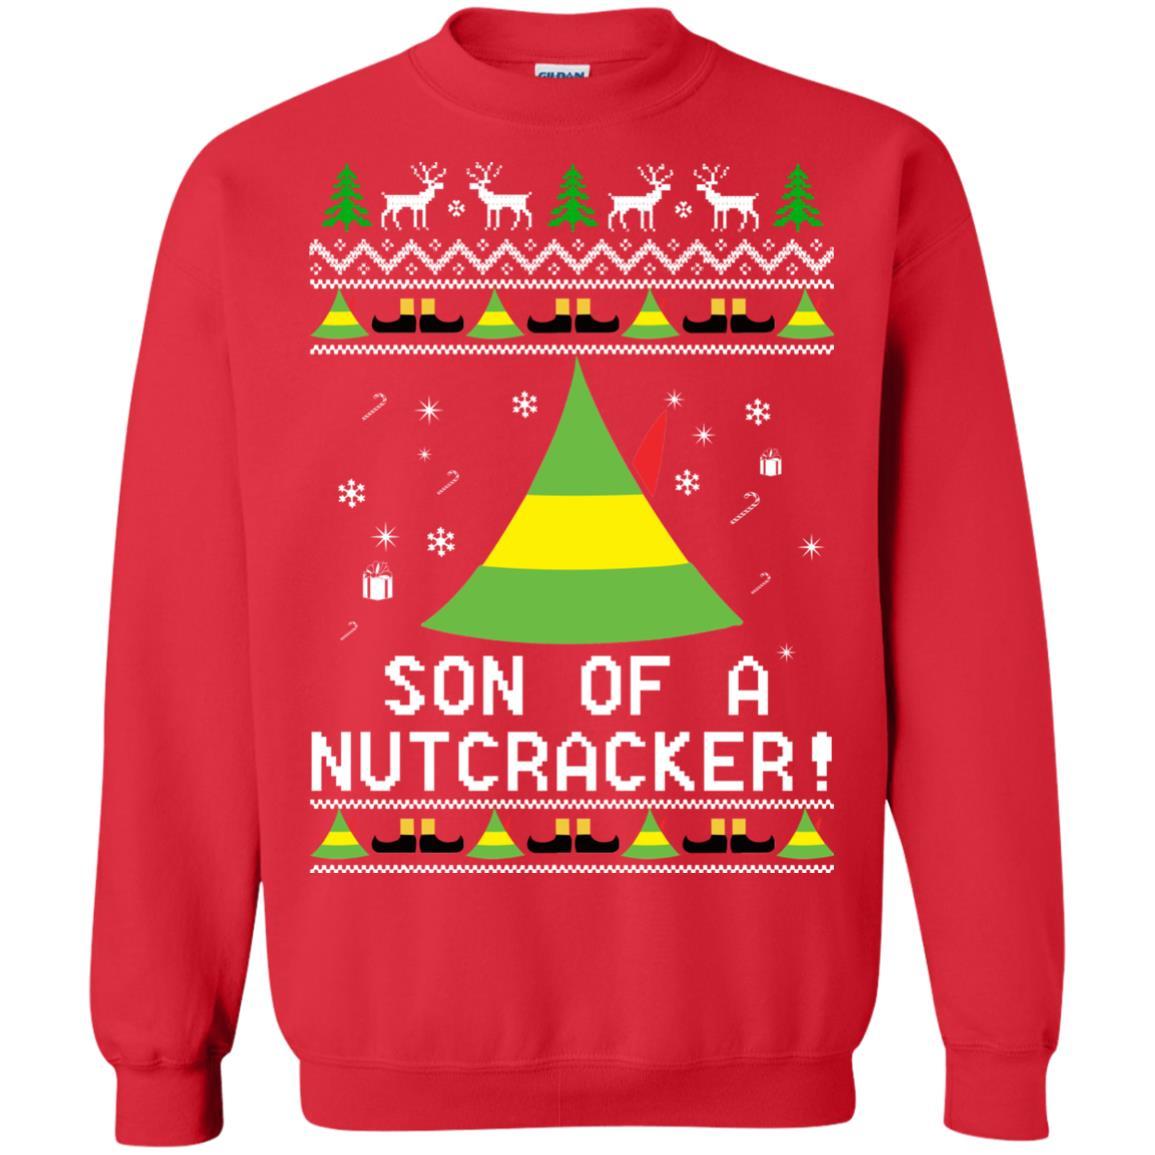 image 1984 - Son of a Nutcracker Elf Christmas Sweatshirt, Ugly Sweater